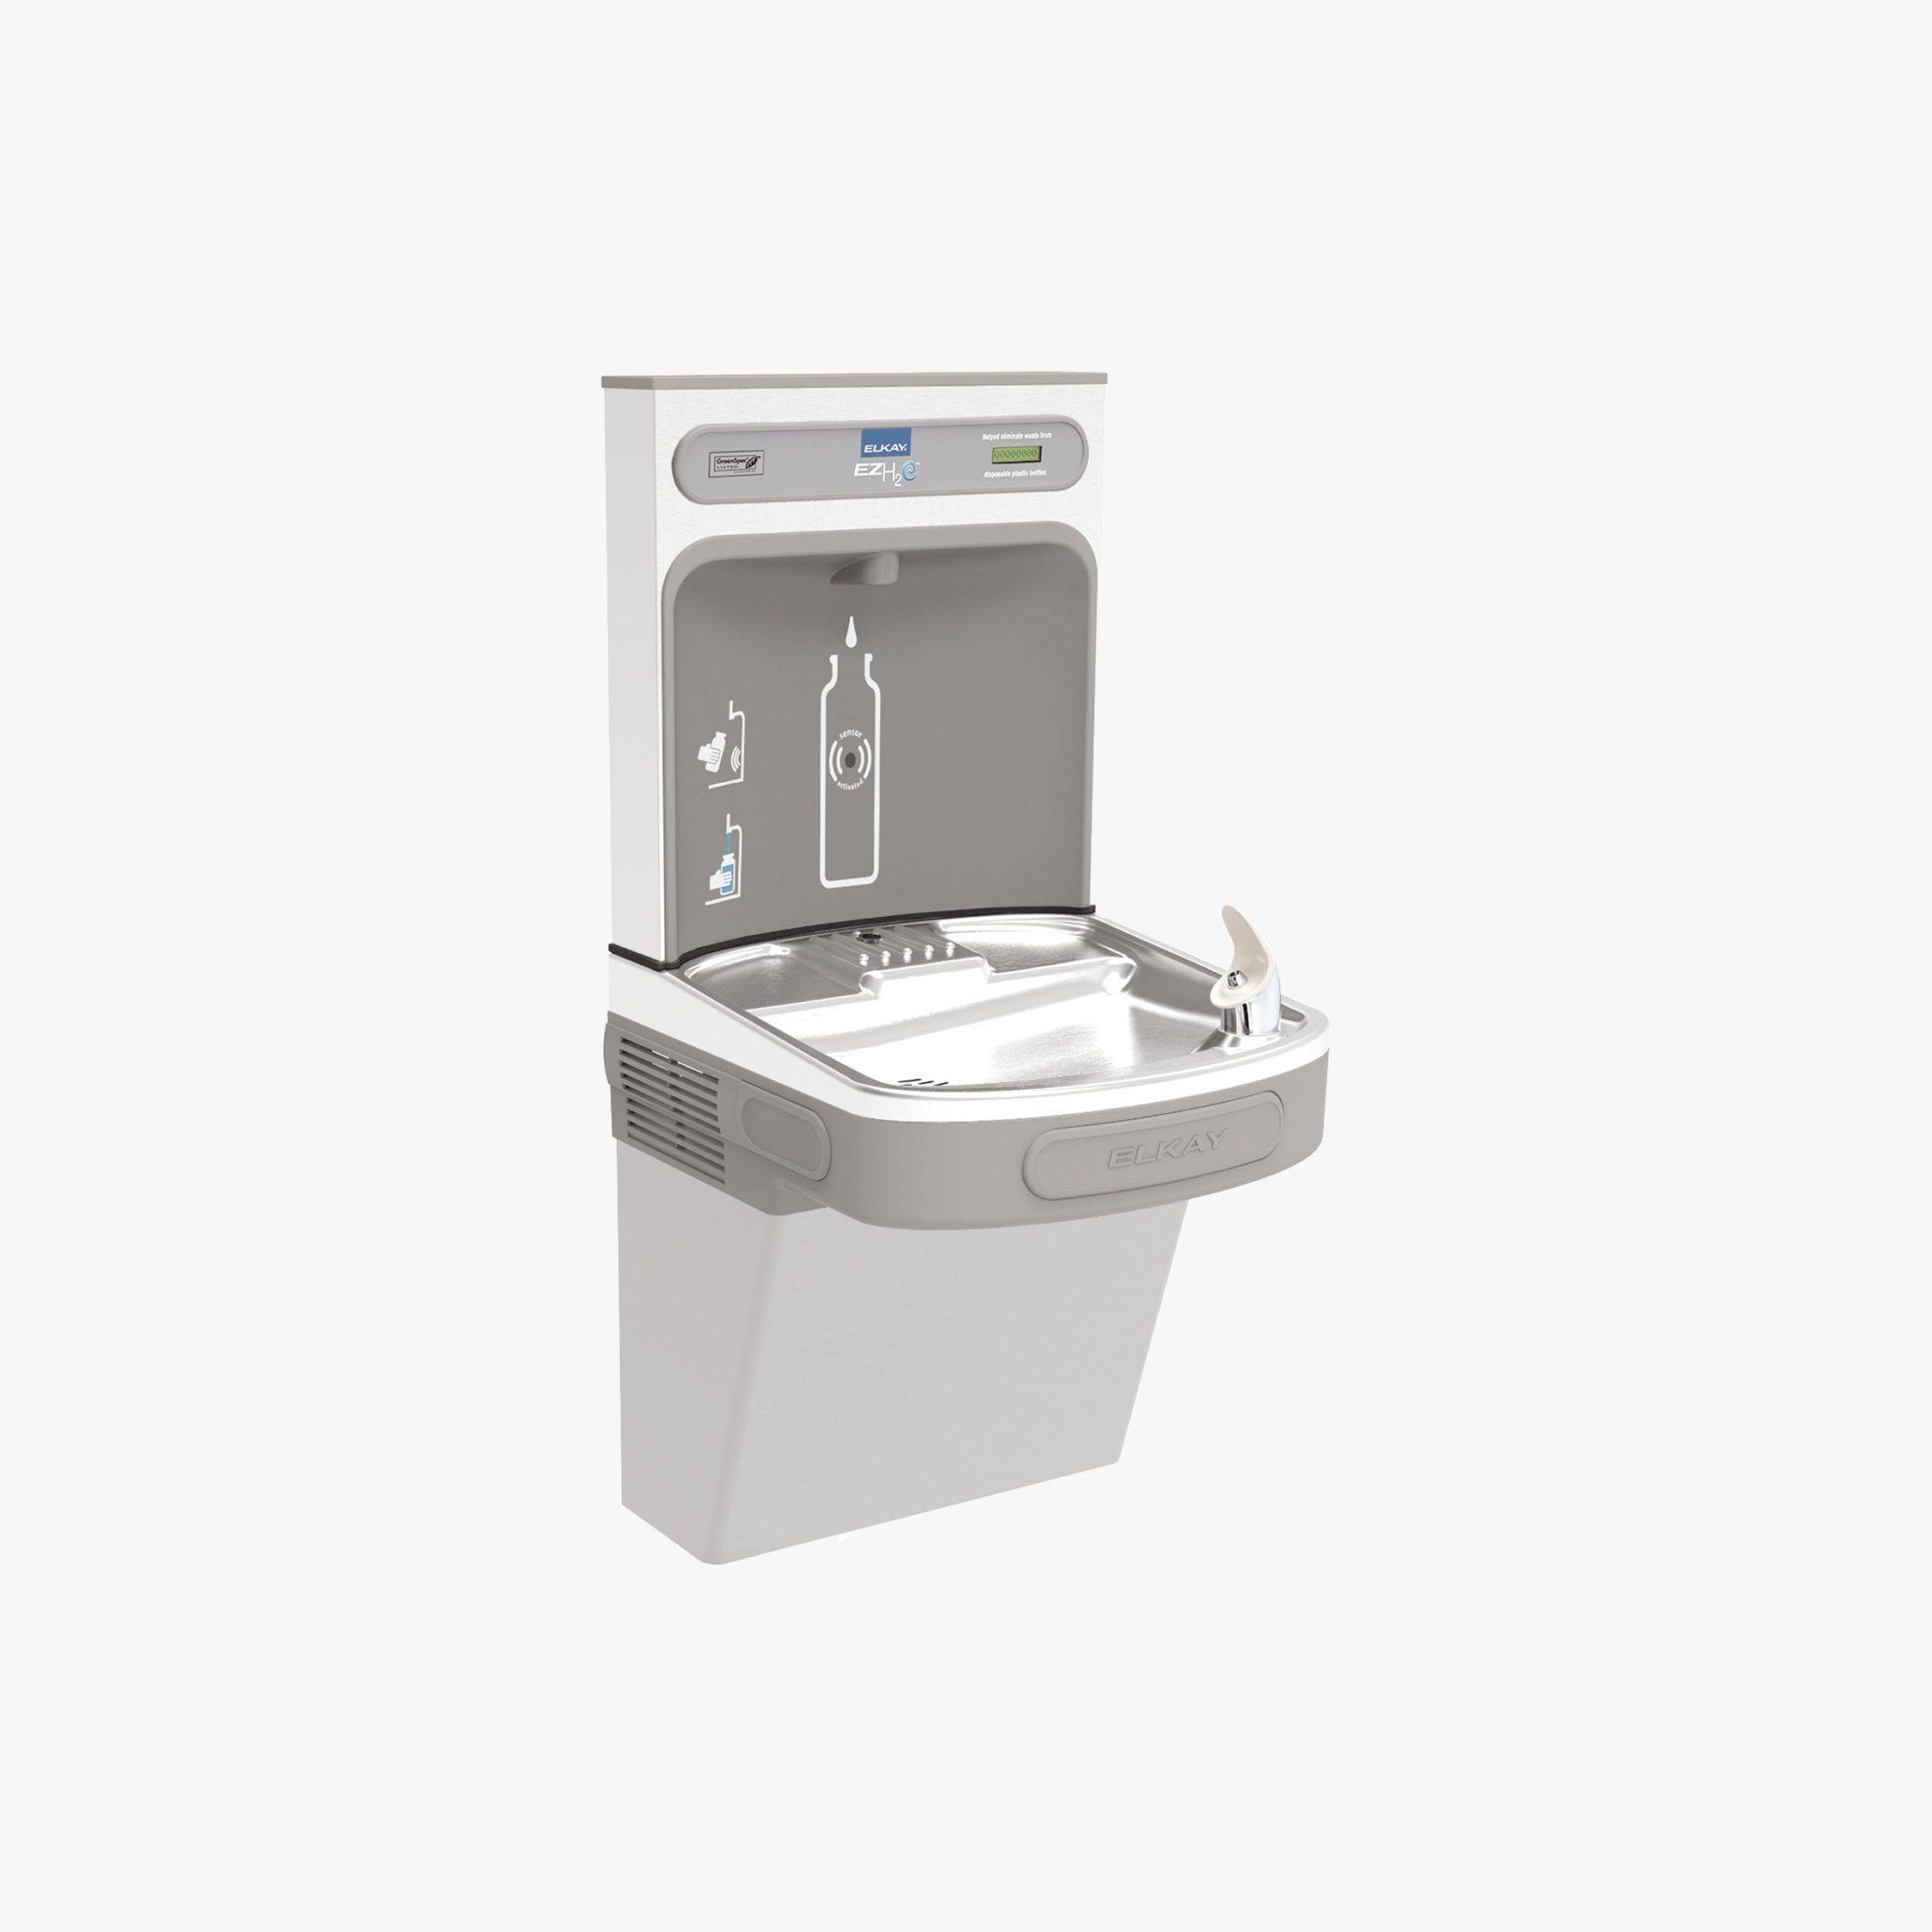 Elkay Ezh2o Drinking Fountain Bottle Filling Station For Summer In 2020 Elkay Clean Water Bottles Drinking Fountain